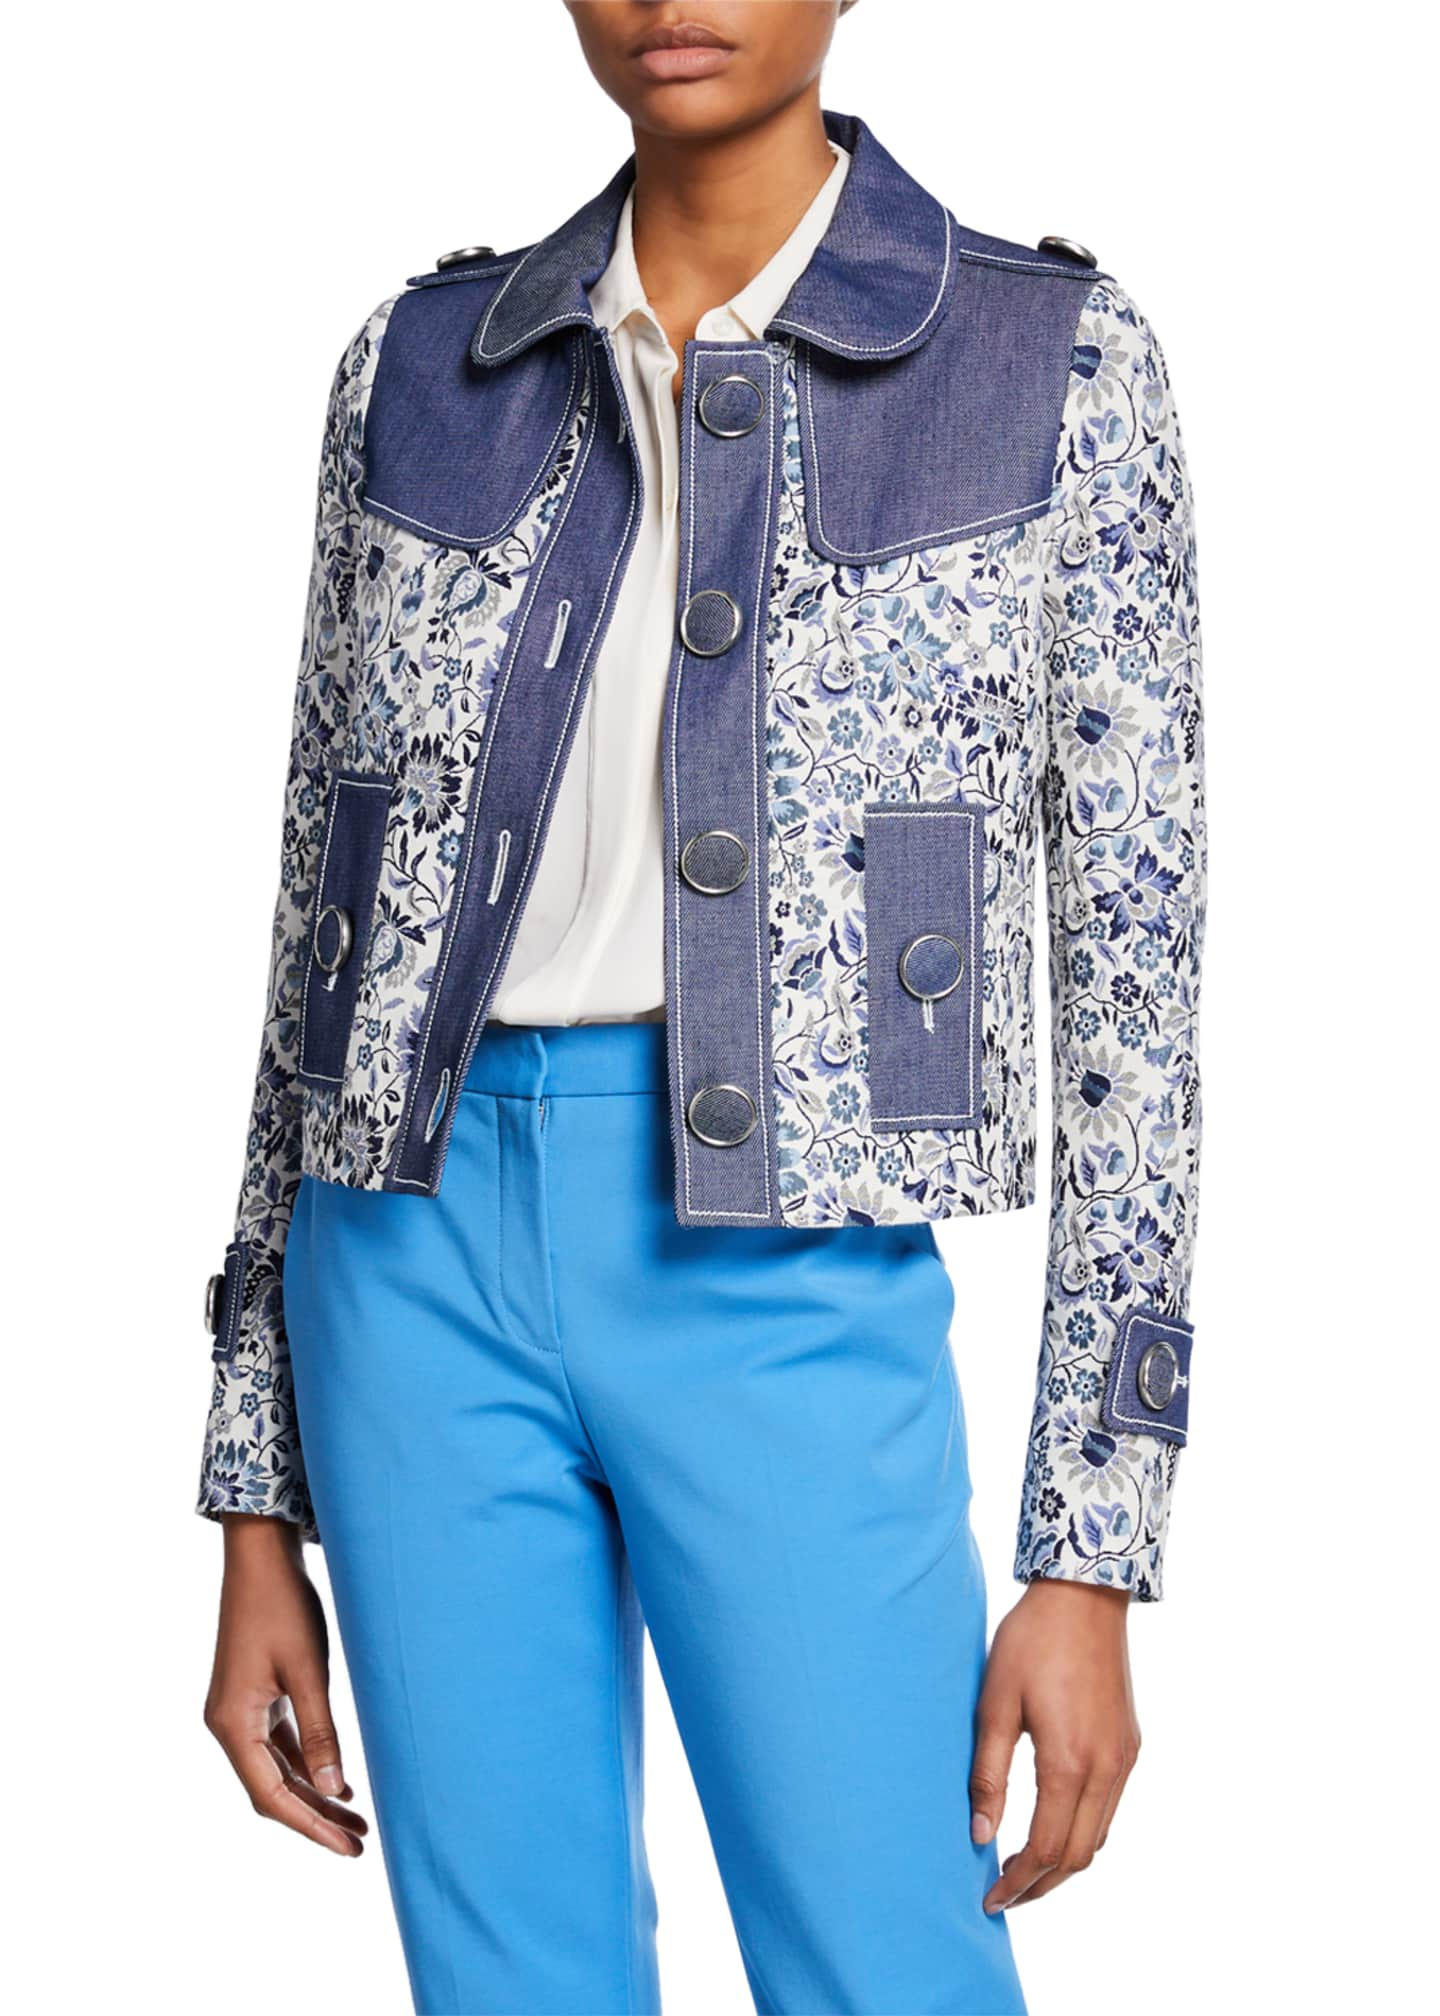 Andrew Gn Floral Jacket with Denim Trim